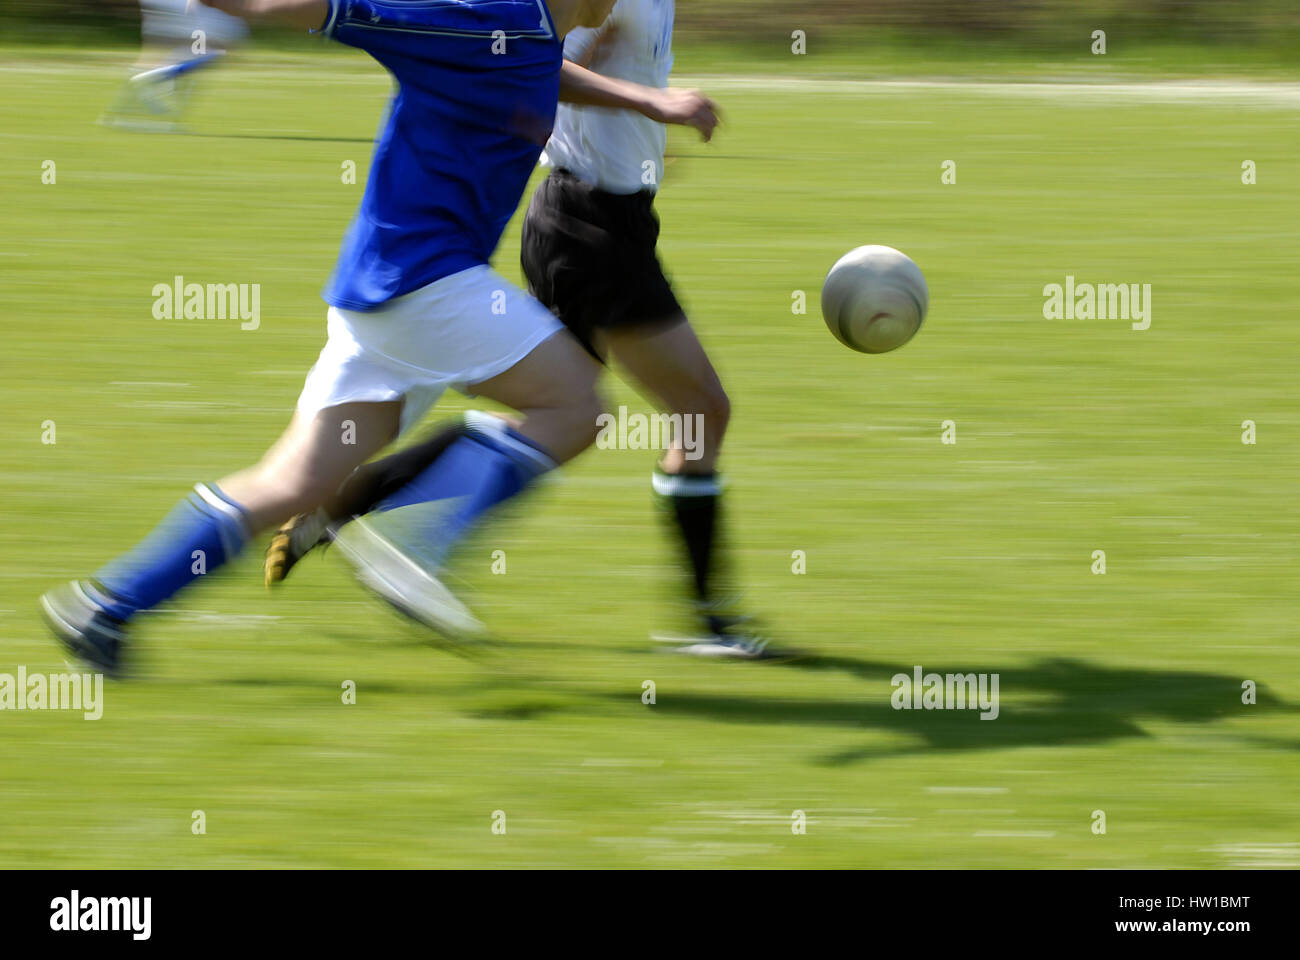 Football player, Fußballspieler - Stock Image